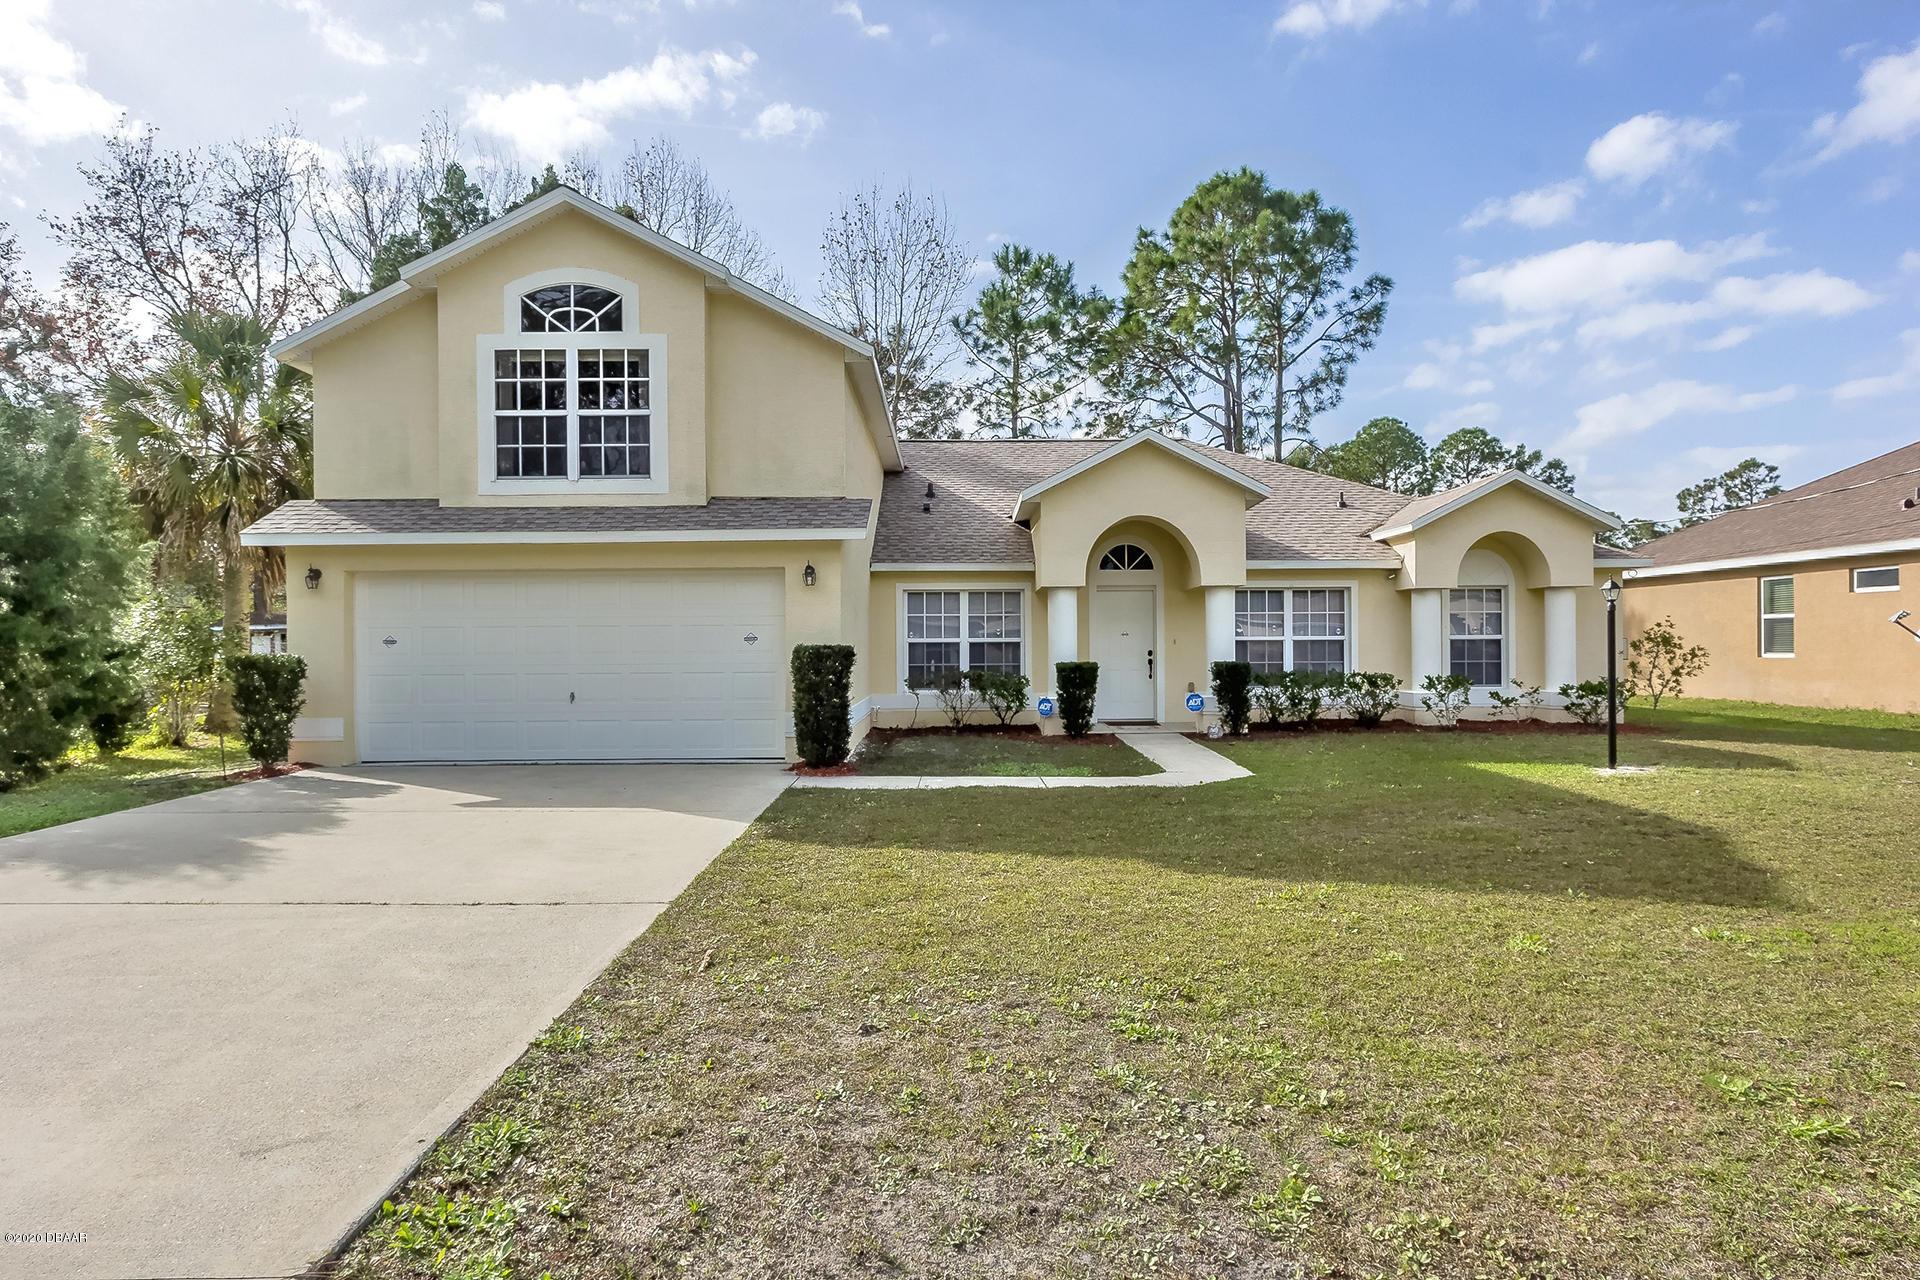 Photo of 10 Potterville Lane, Palm Coast, FL 32164